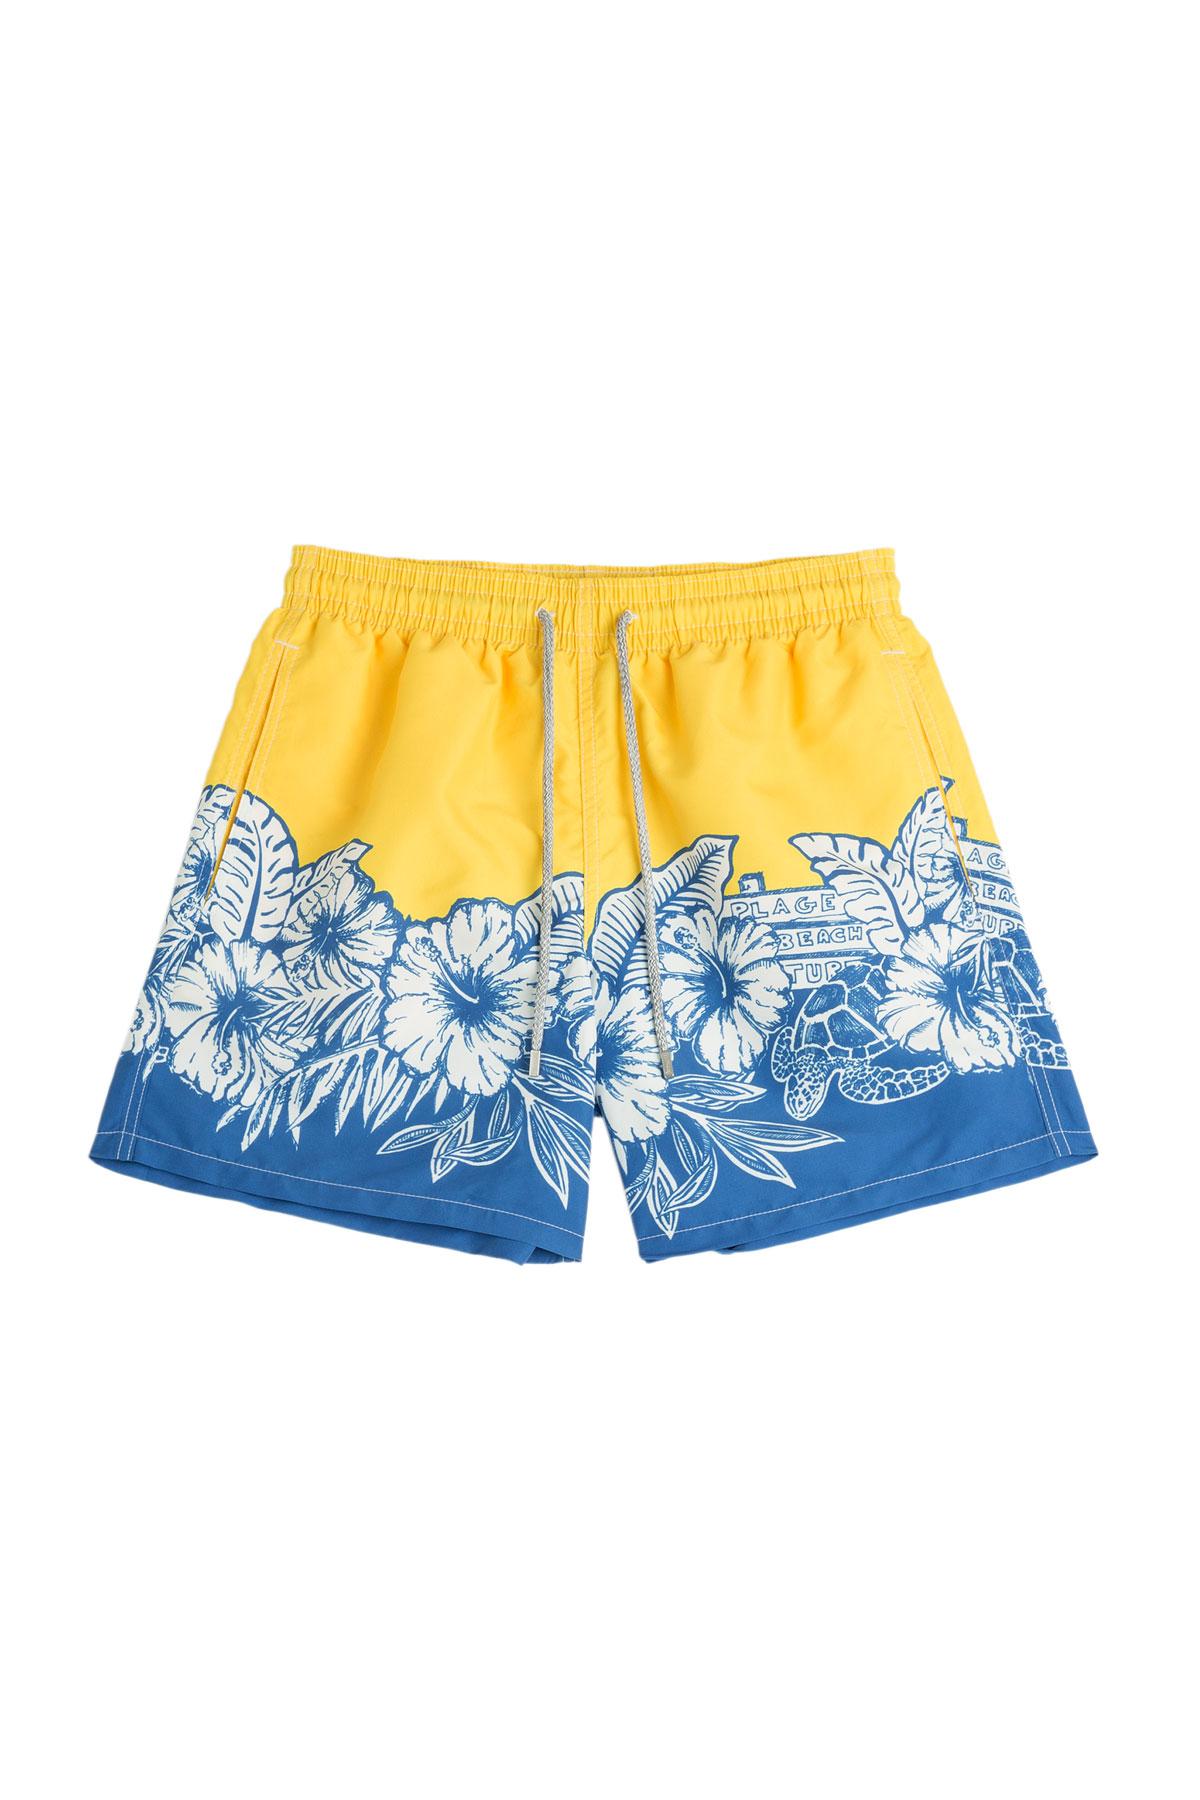 Mens Baby Blue And Yellow Swim Trunks 89